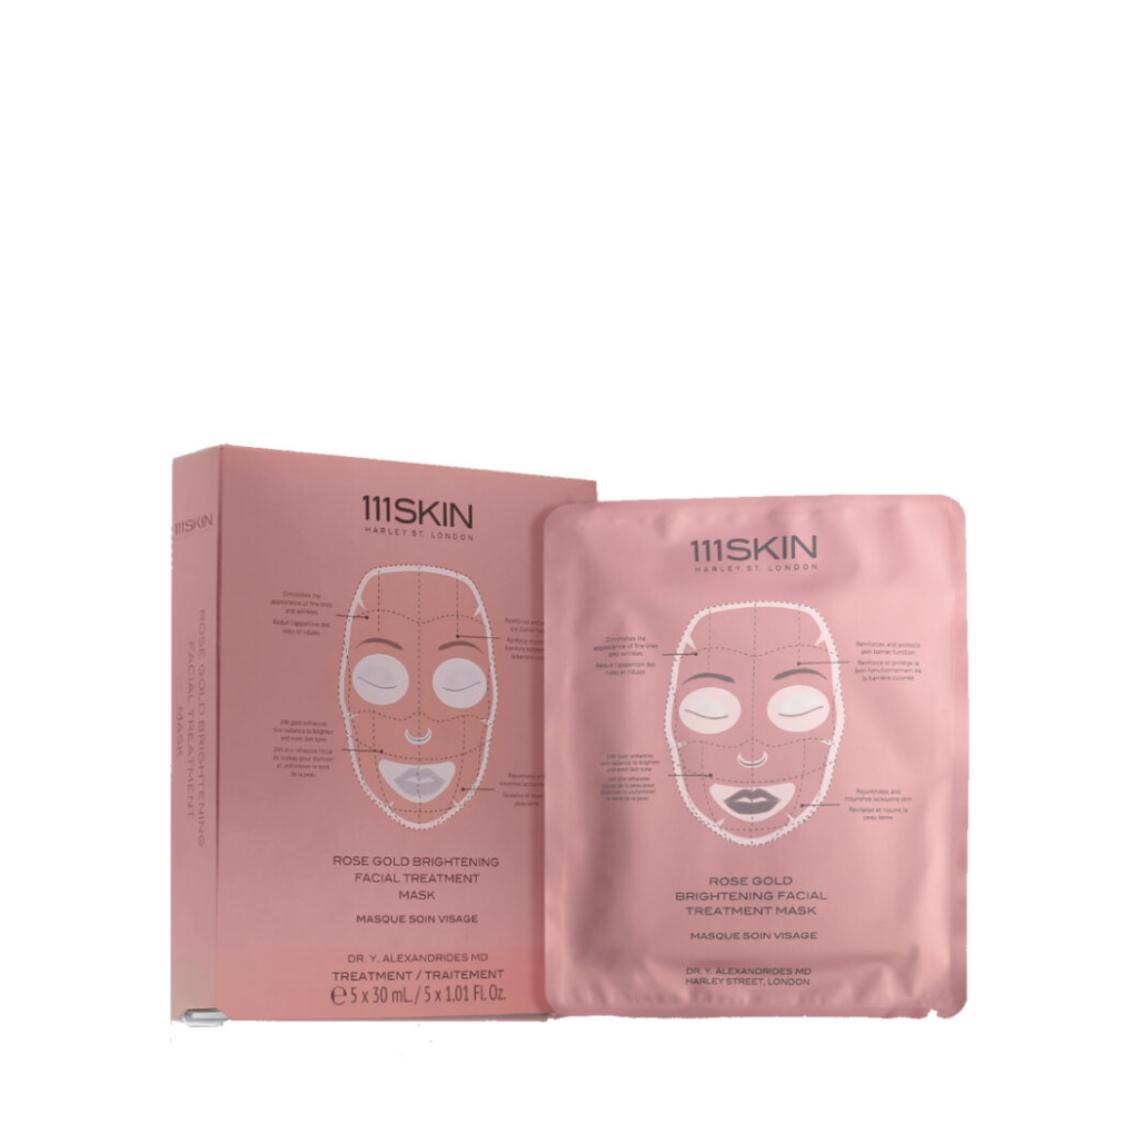 111SKIN Rose Gold Brightening Facial Mask Treatment